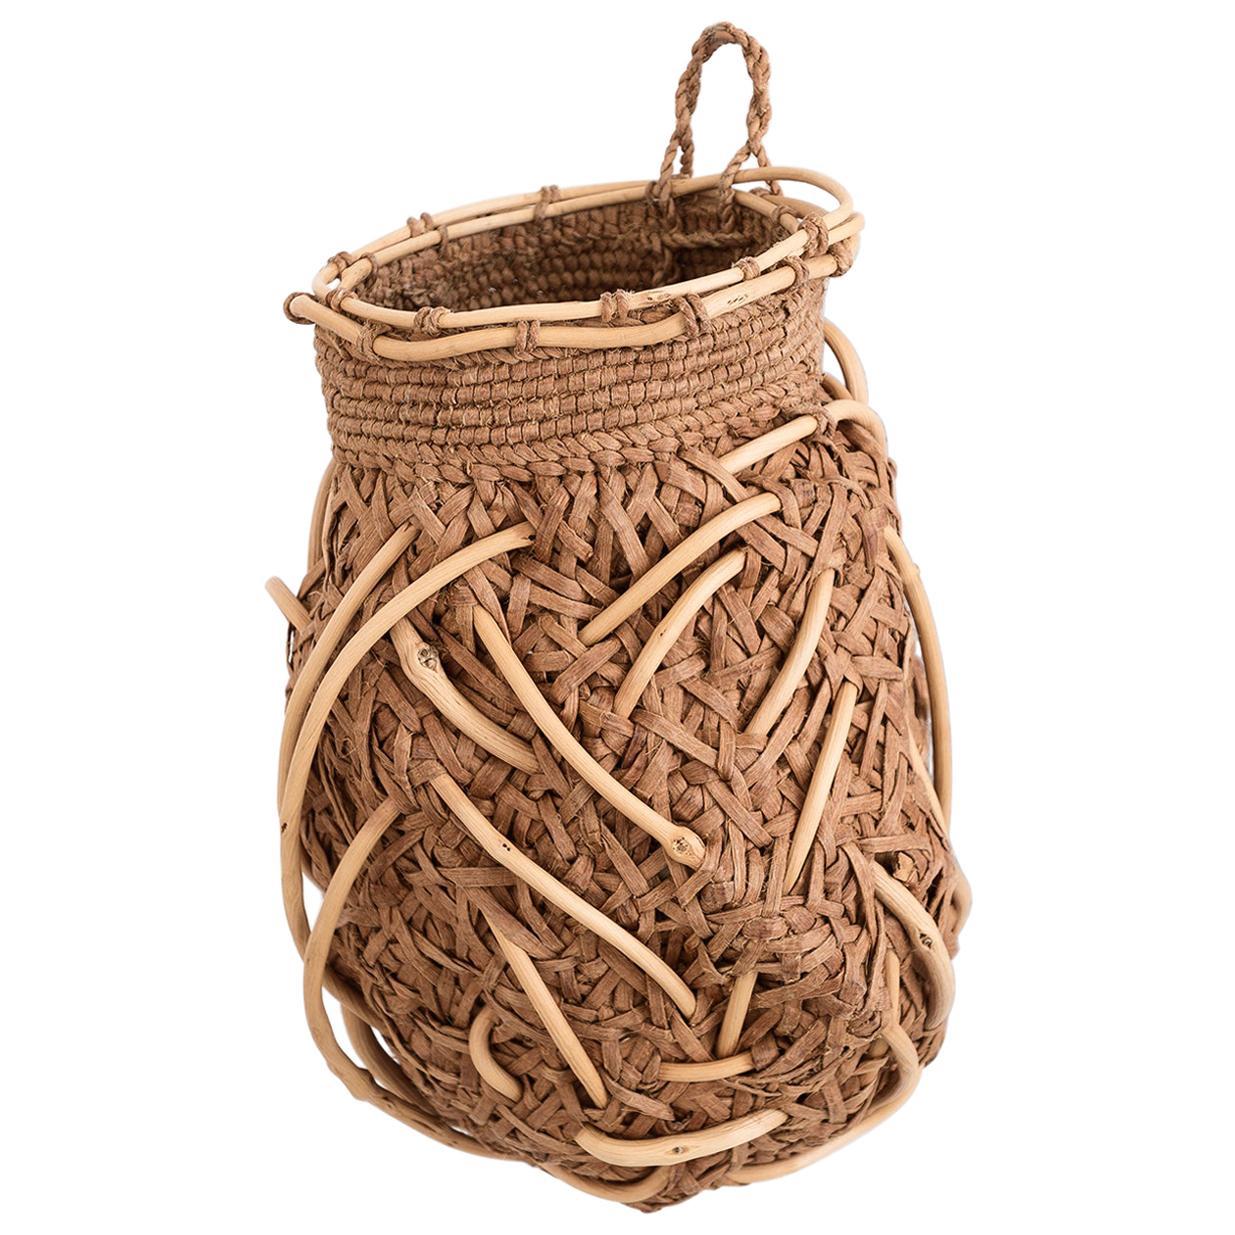 Jennifer Zurick Nesting Instinct, Contemporary Crafts Baskets, Willow Bark, 2020